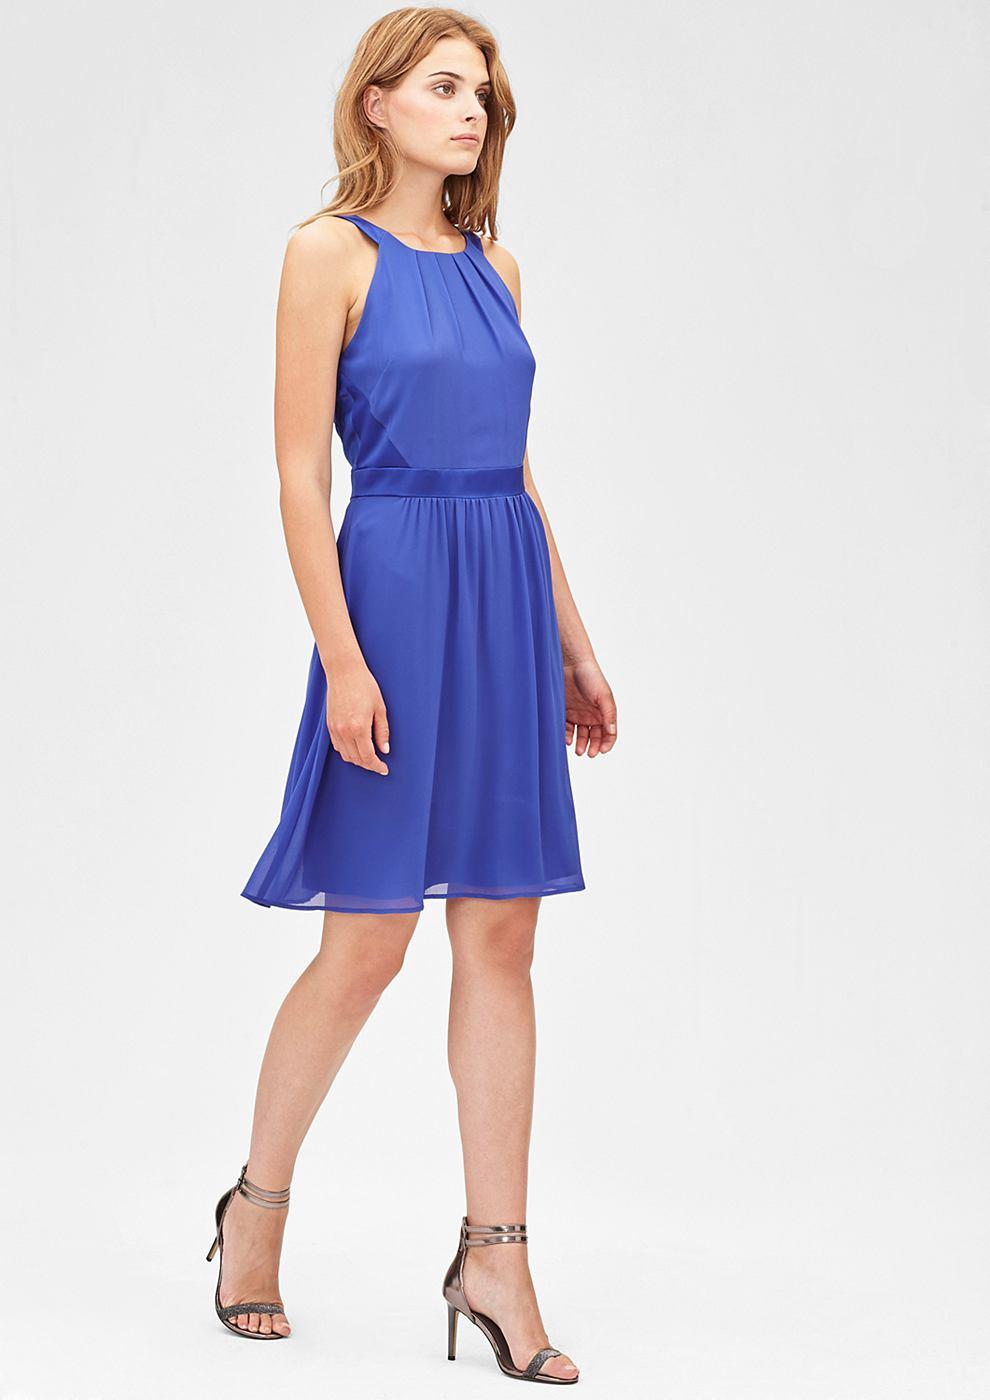 s.Oliver Premium Zwierige chiffon jurk blauw